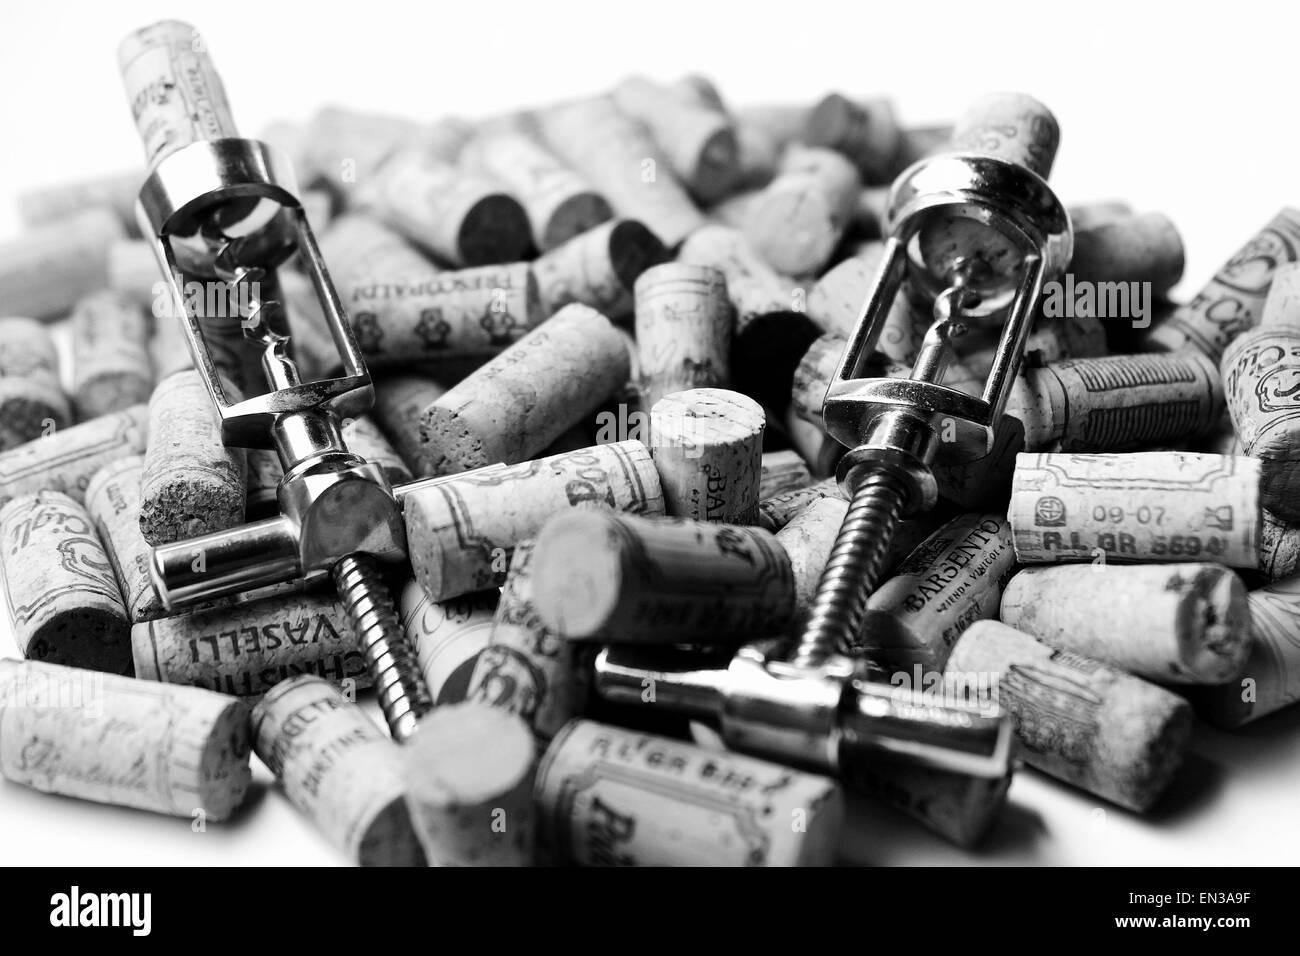 Corkscrews and corks - Stock Image